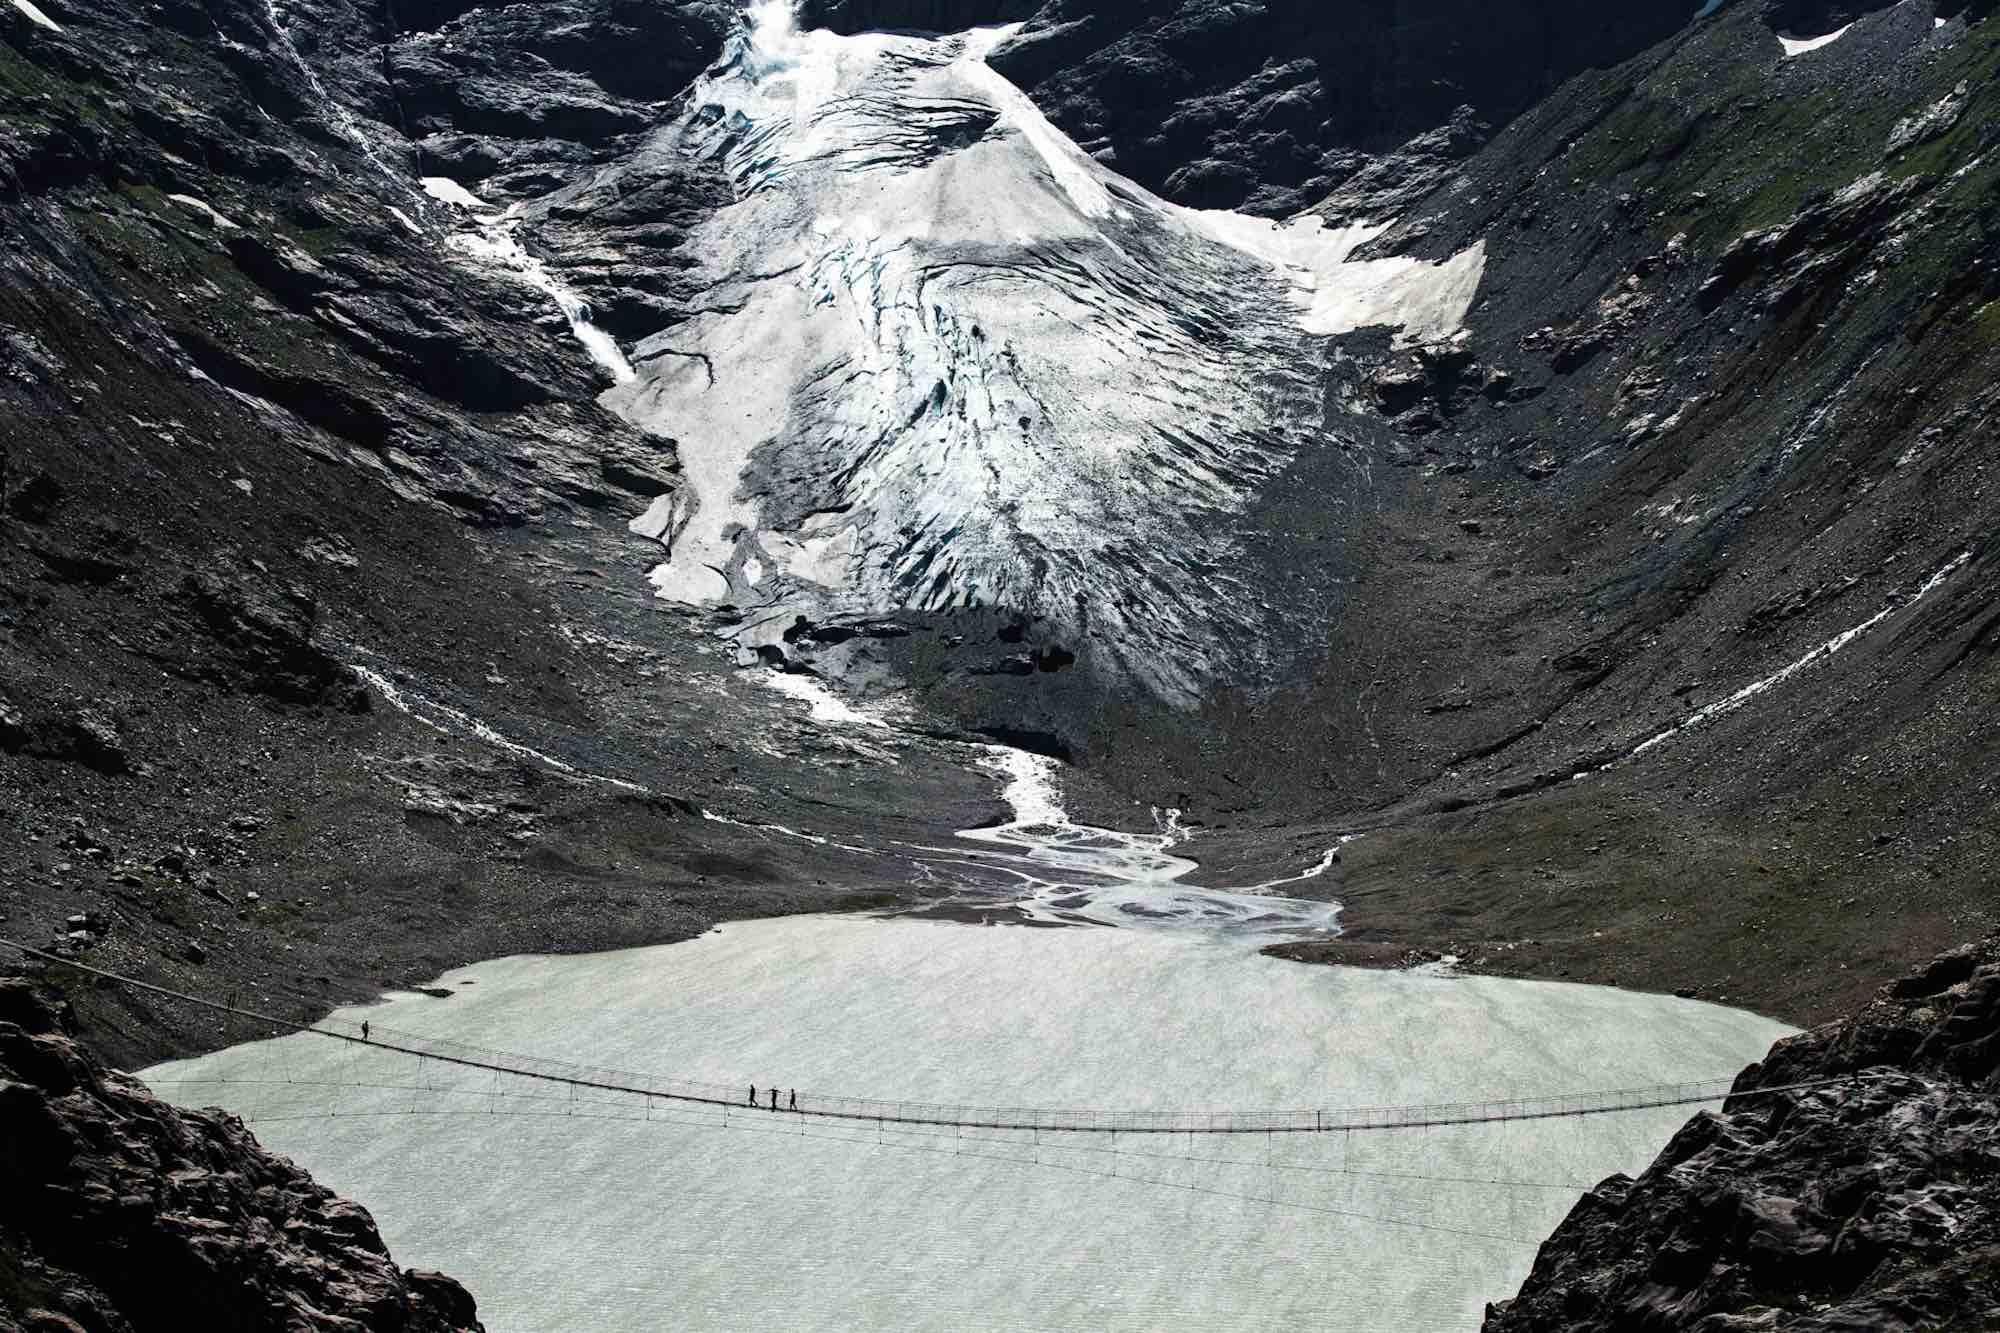 Glacial Lake - Yann Arthus-Bertrand